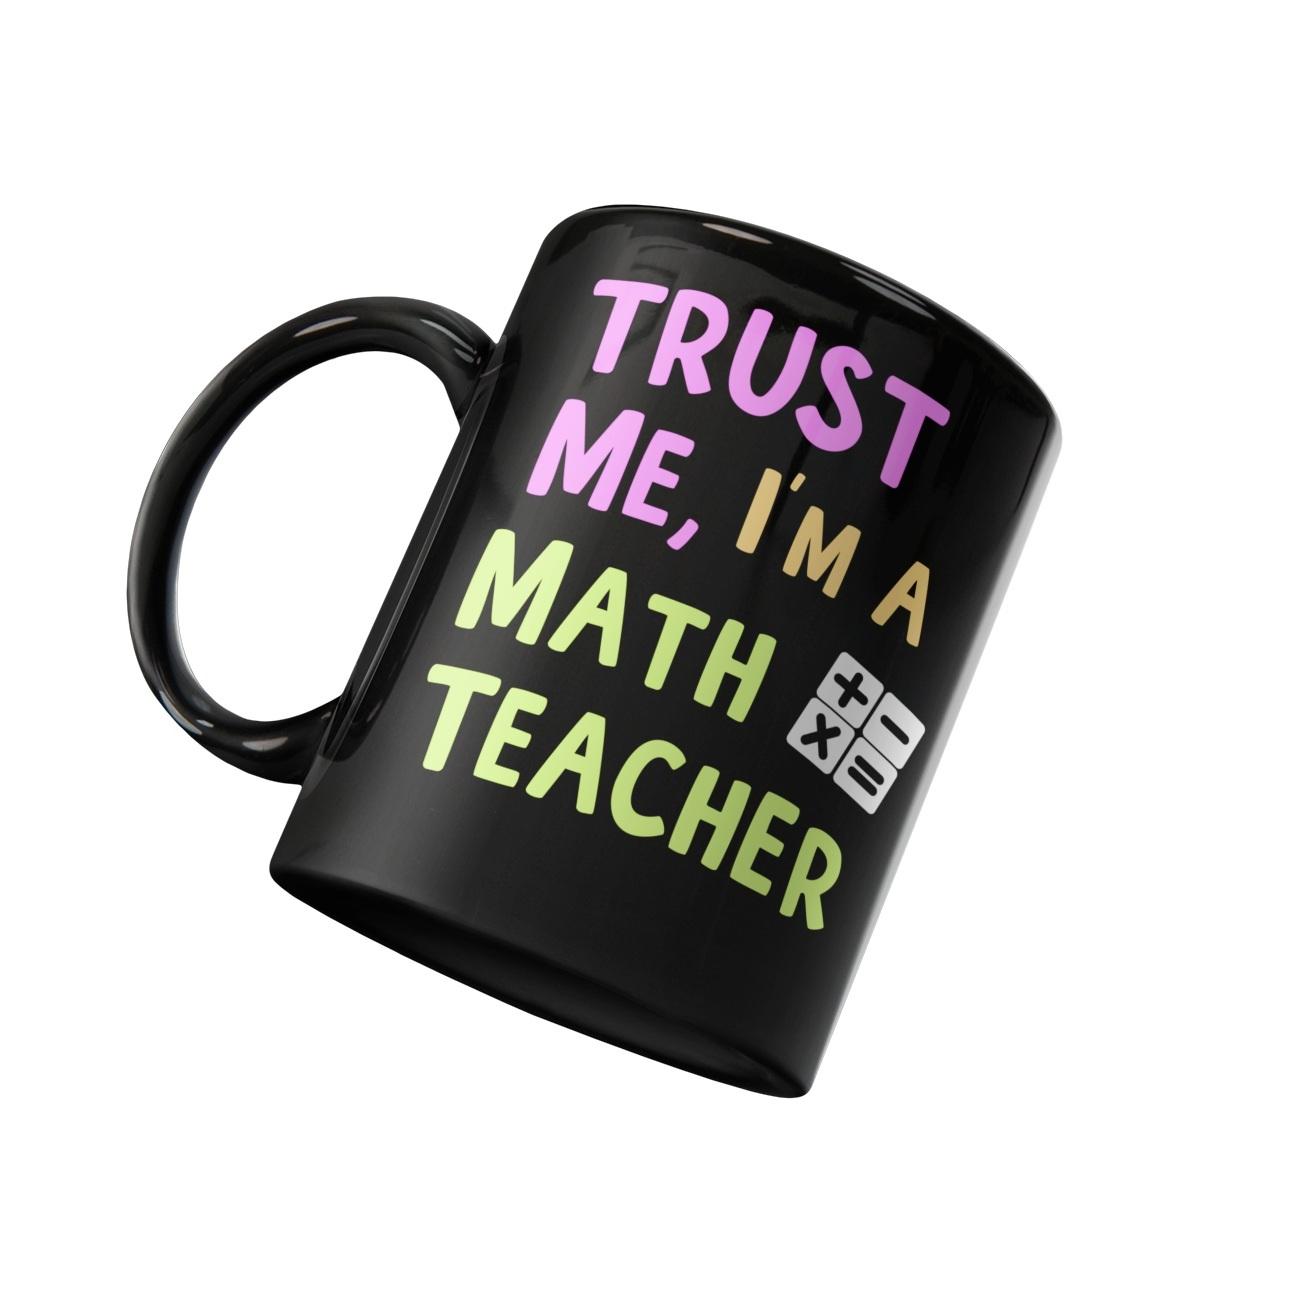 mockup-of-a-coffee-mug-floating-mid-air-24491%2B%25283%2529.jpg